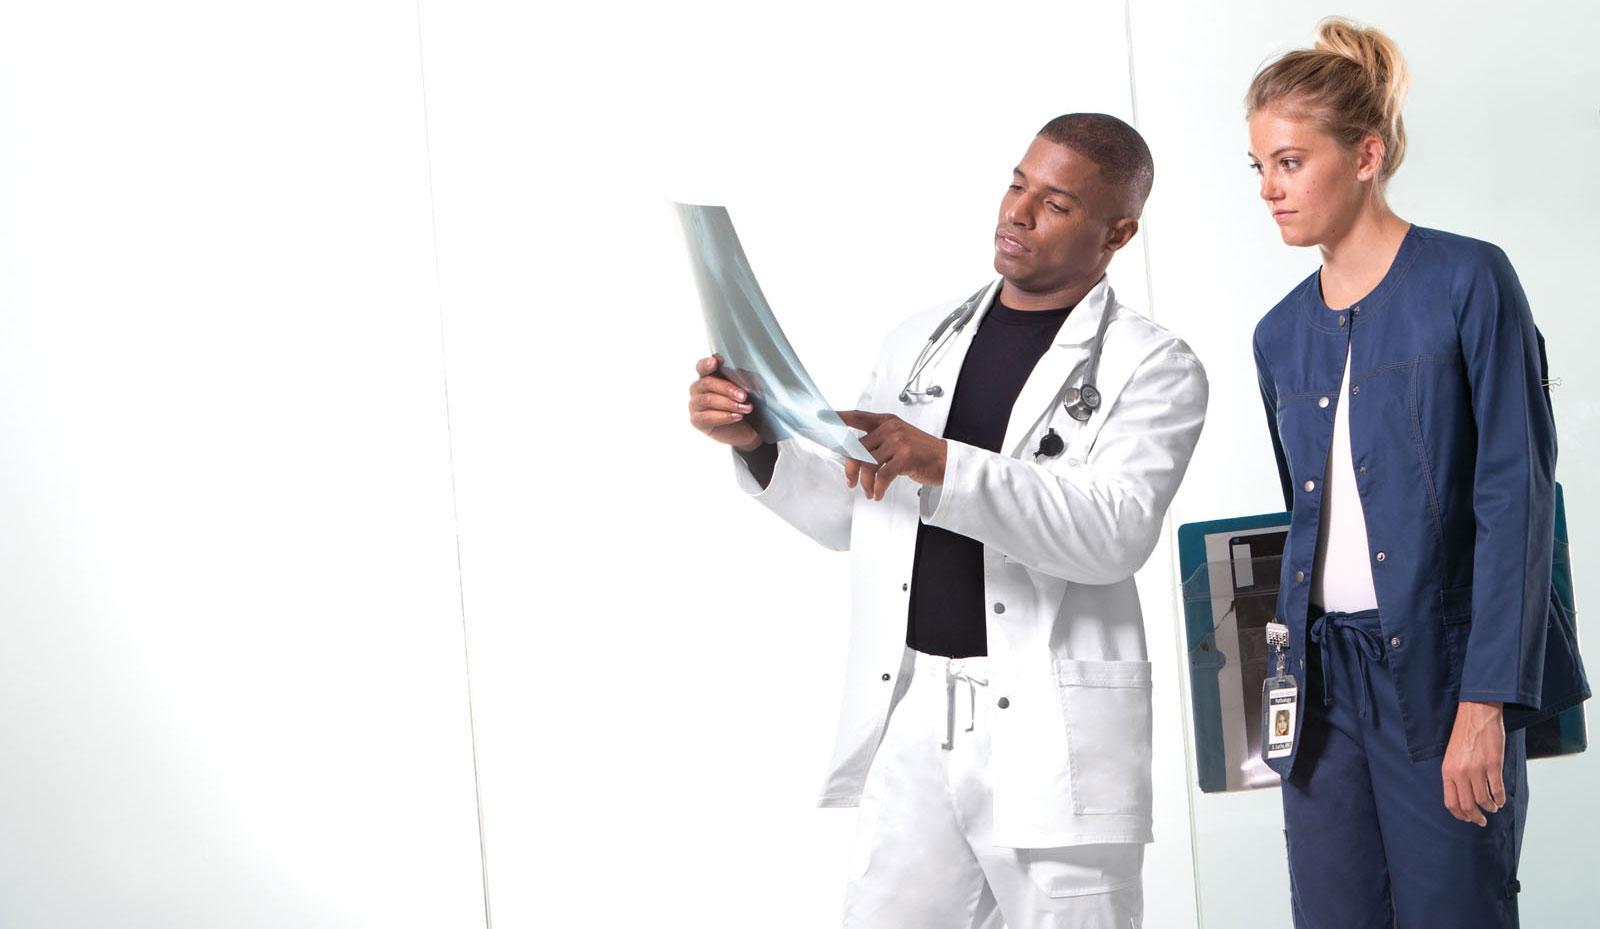 Scrub Hub prn uniforms, medical supplies, and nursing accessories